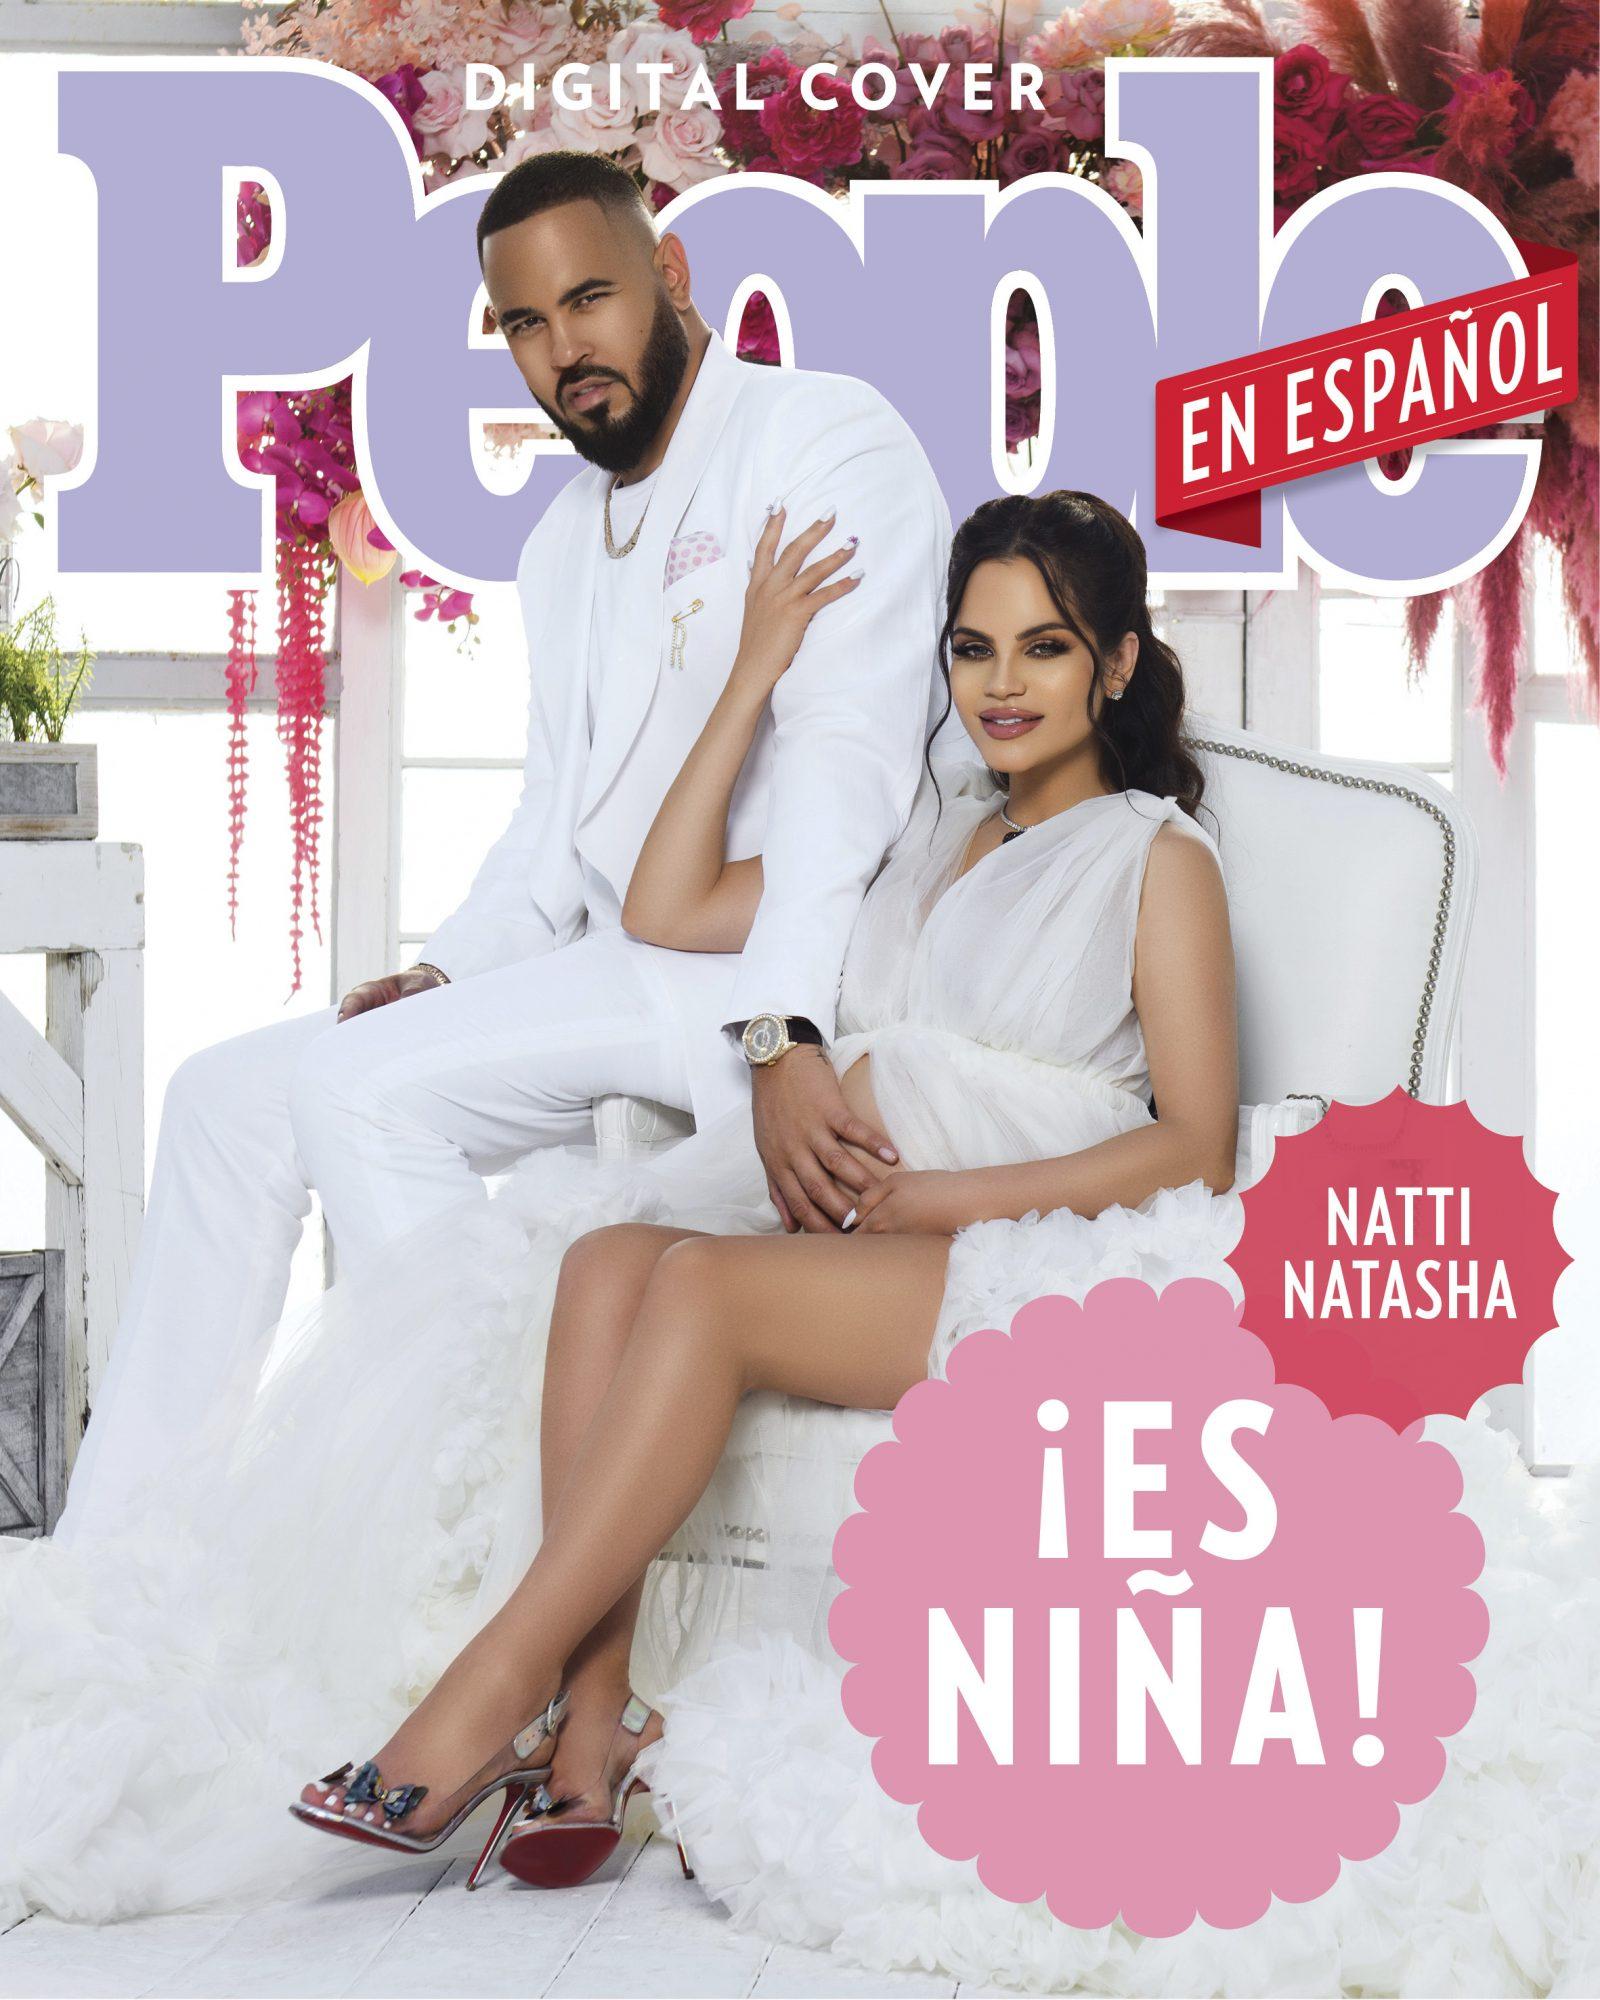 Natti Natasha Gender Reveal Digital Cover